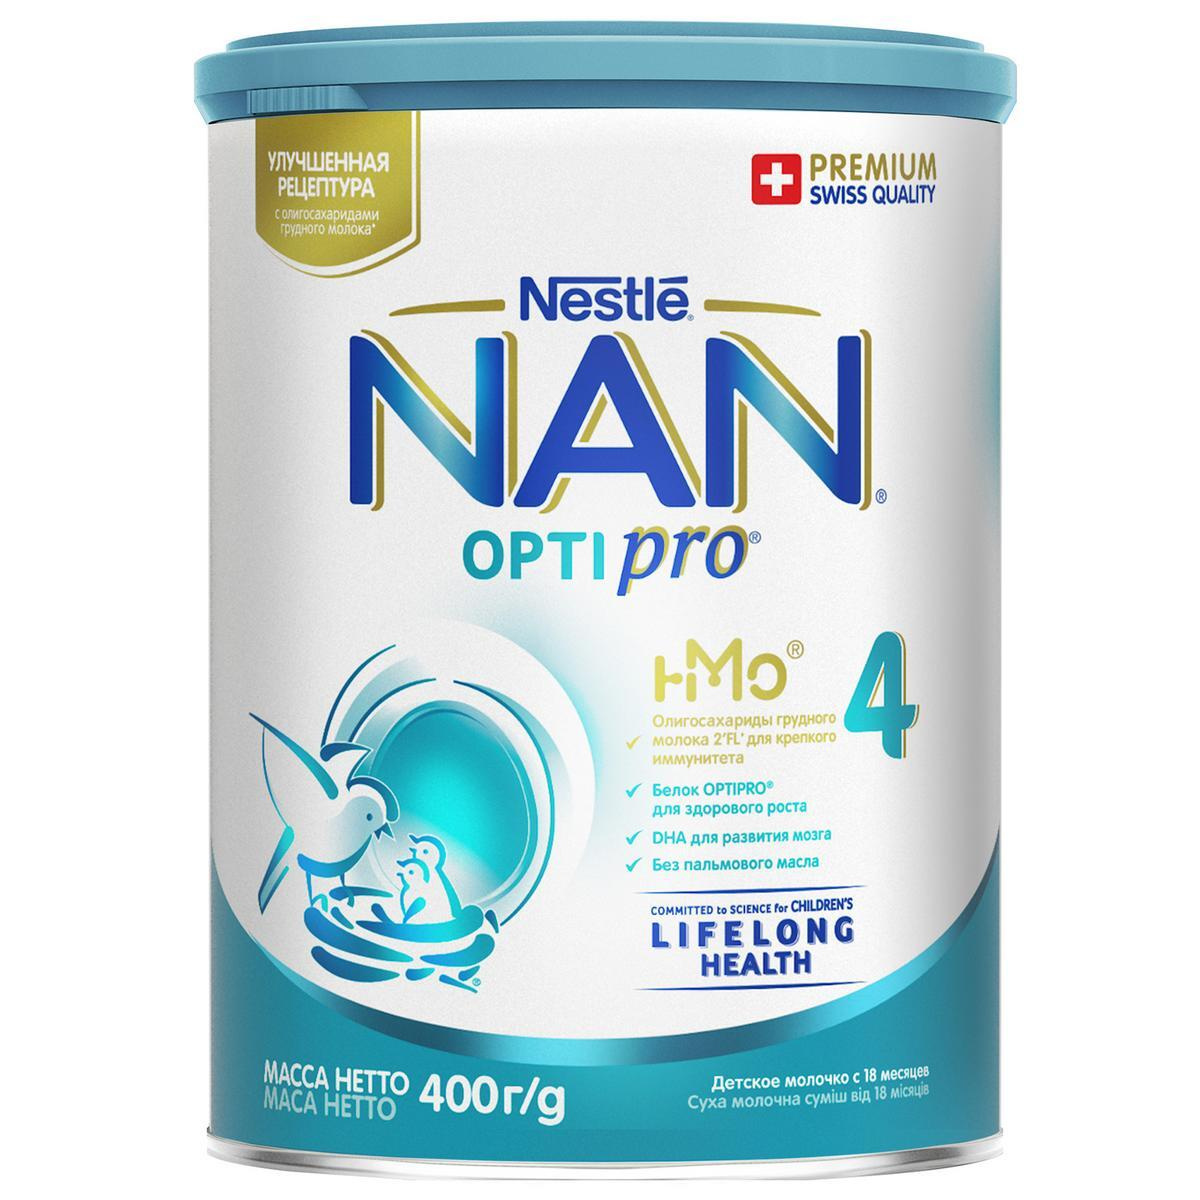 Молочная смесь Nestle NAN 4 Optipro, для роста, иммунитета и развития мозга, с 18 месяцев, 400 г  #1